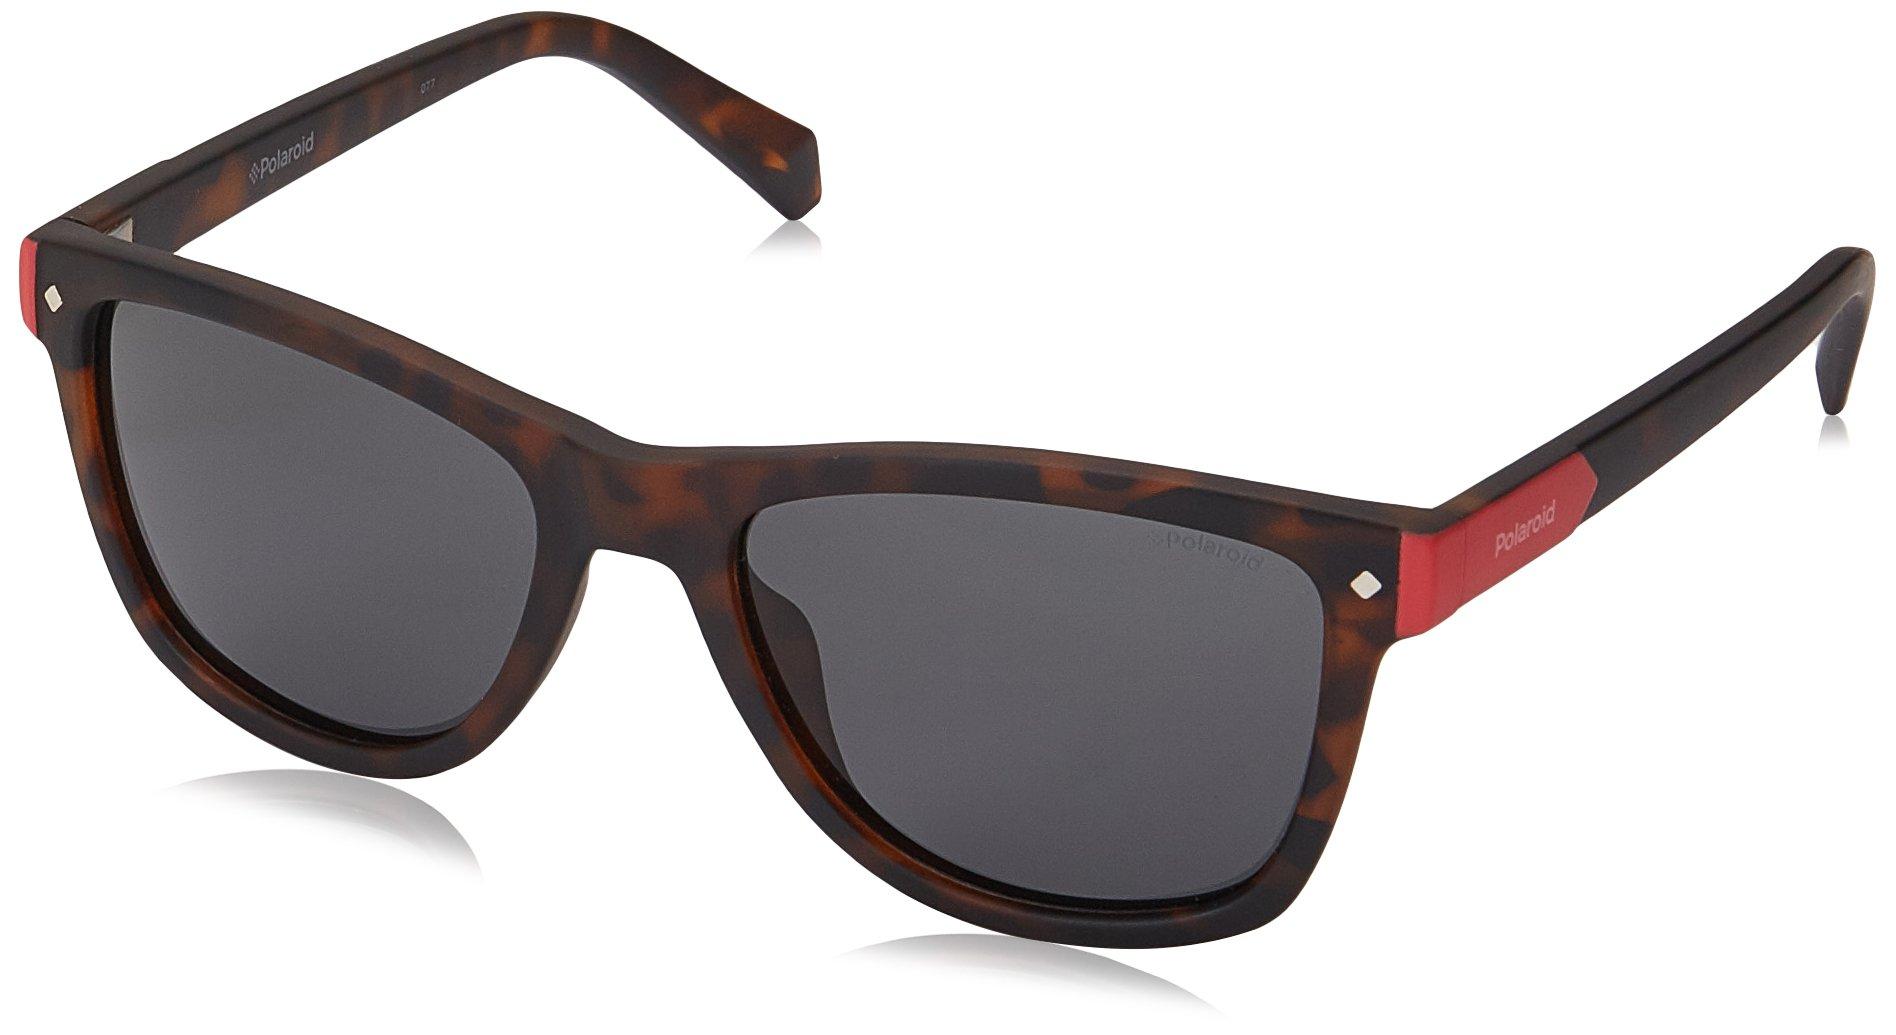 Polaroid Sunglasses Girls' Pld8025s Polarized Rectangular Sunglasses, MATT HVNA, 48 mm by Polaroid Sunglasses (Image #1)